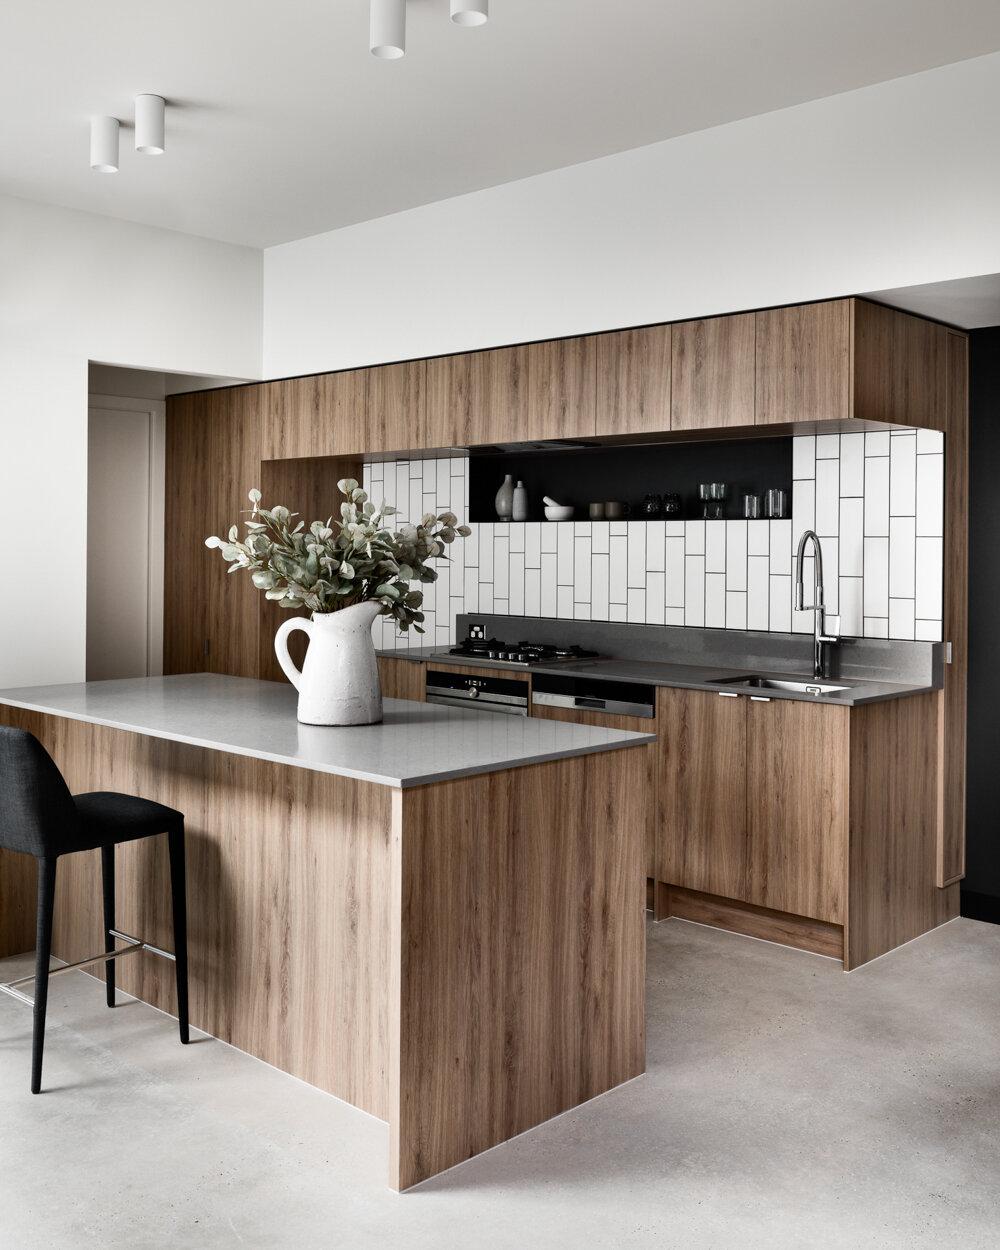 MUSK - Albert Park Extension-The Design Emotive Local Australian Architecture-04.jpg